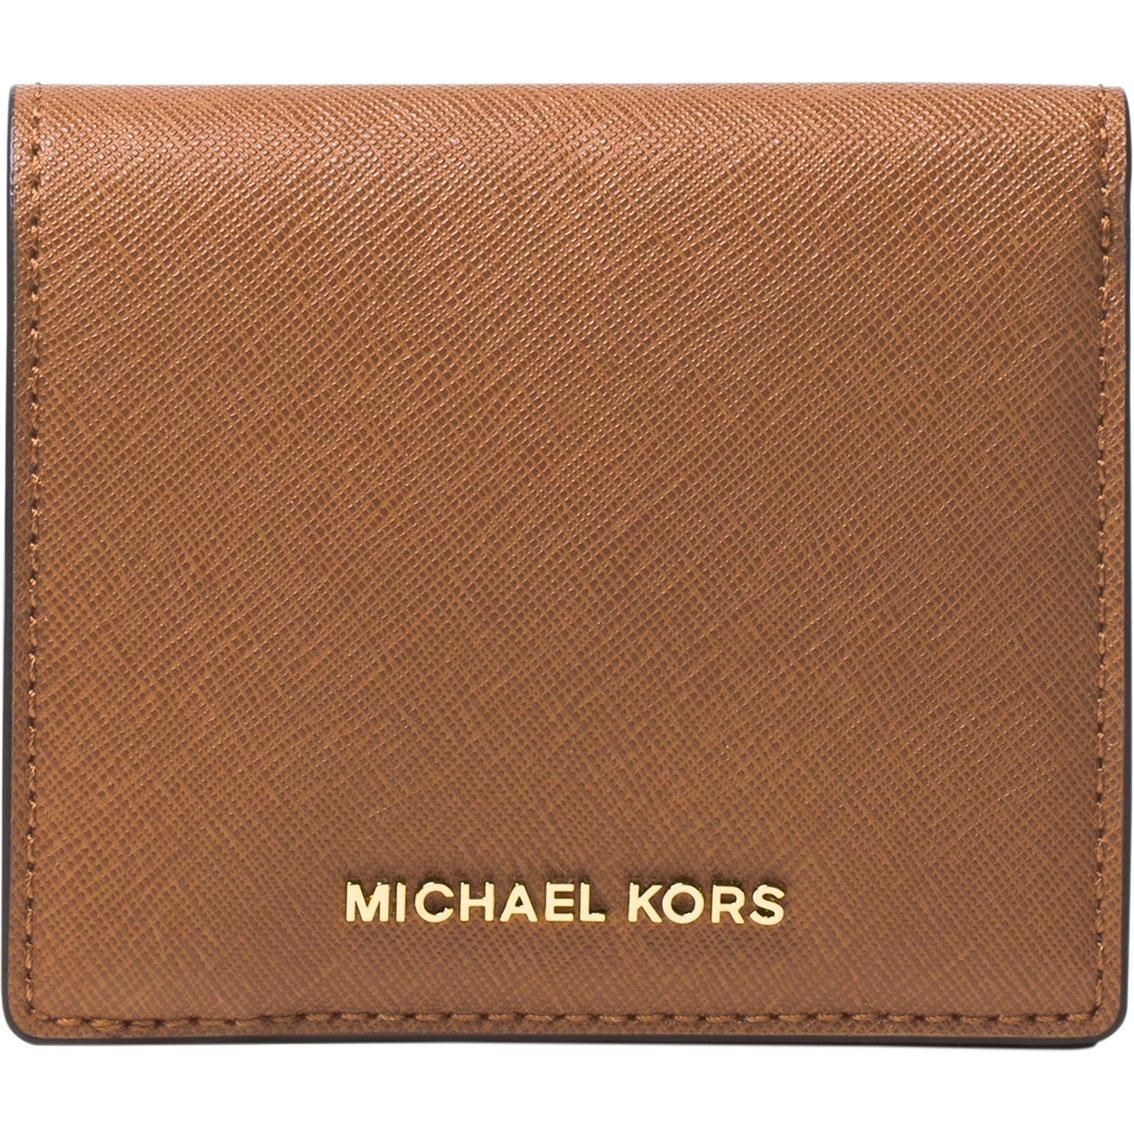 c034e7d675ff Michael Kors Jet Set Travel Leather Carryall Card Case